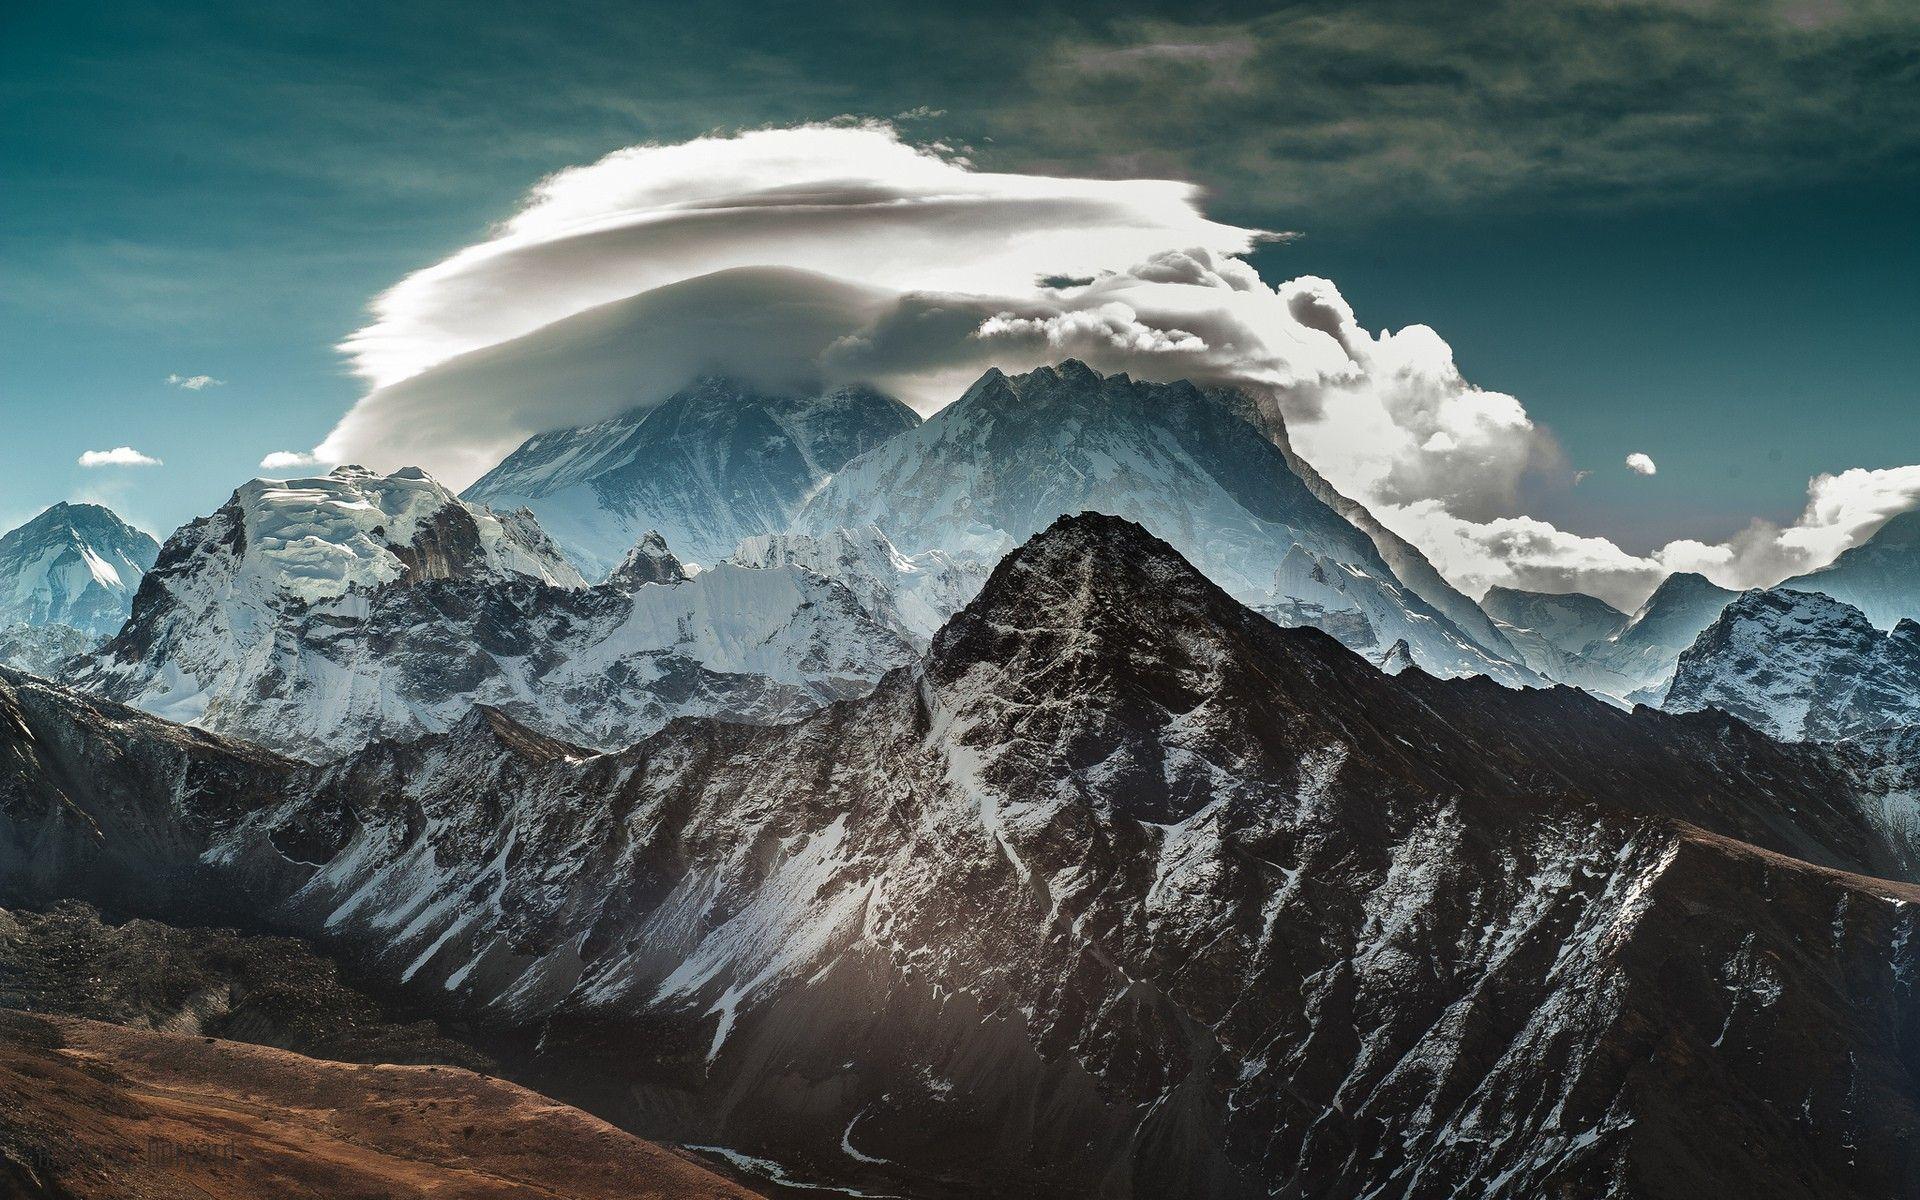 Best Wallpaper Mountain Ipod - b44ef8ec6c0b43dbf376eebbd945714c  You Should Have_428236.jpg